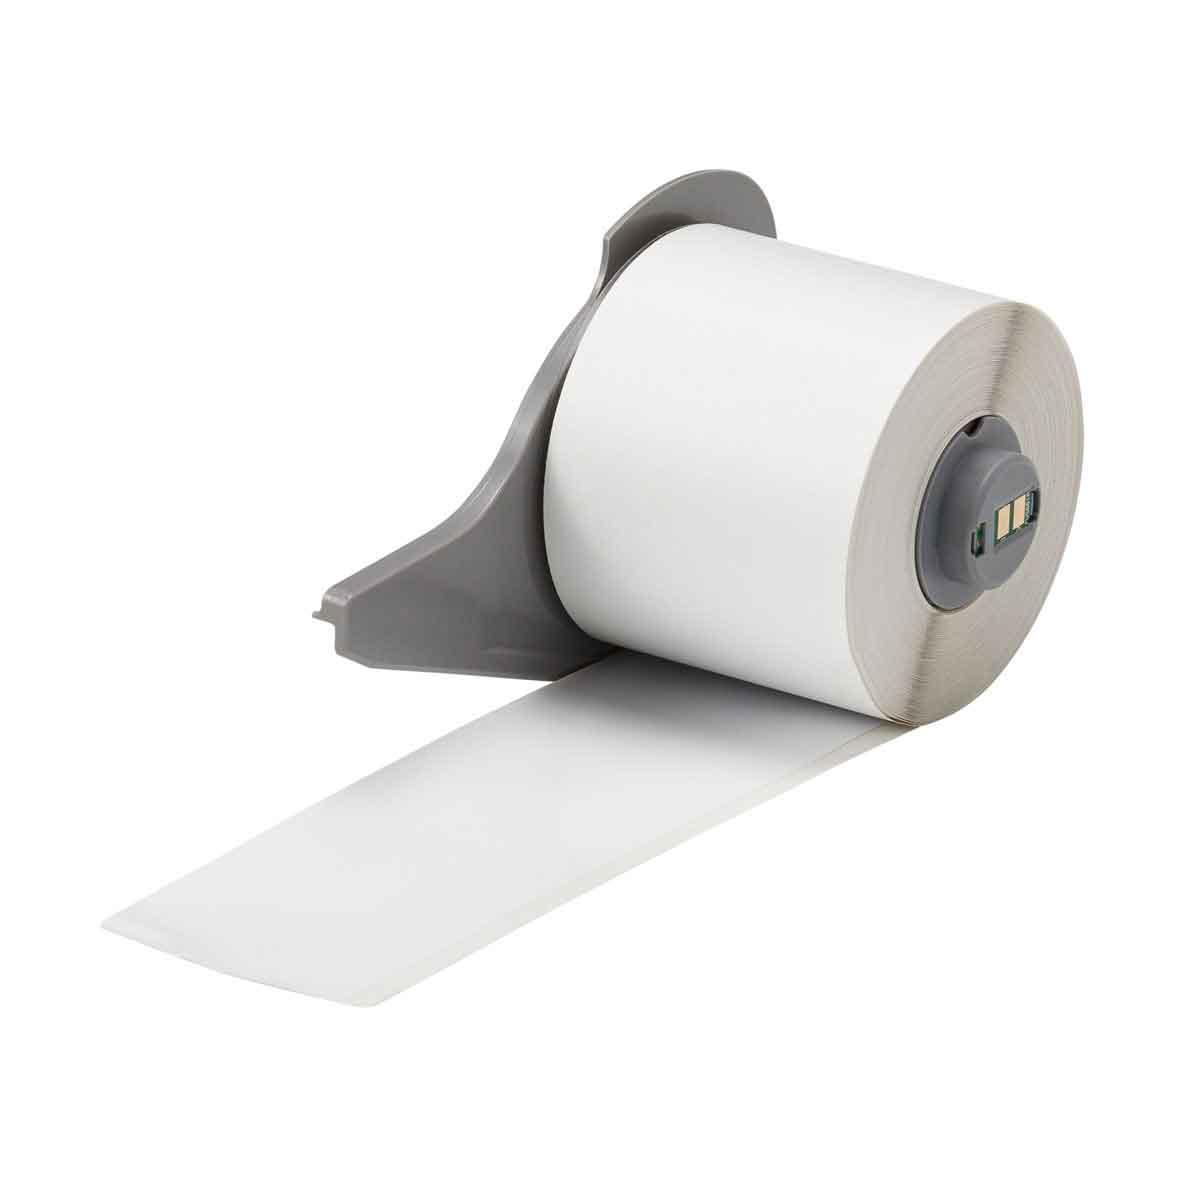 Brady® M71C-2000-595-WT Blank Thermal Transfer Tape, 50 ft L x 2 in W, White, B-595 Vinyl, Permanent Acrylic Adhesive, -40 to 180 deg F